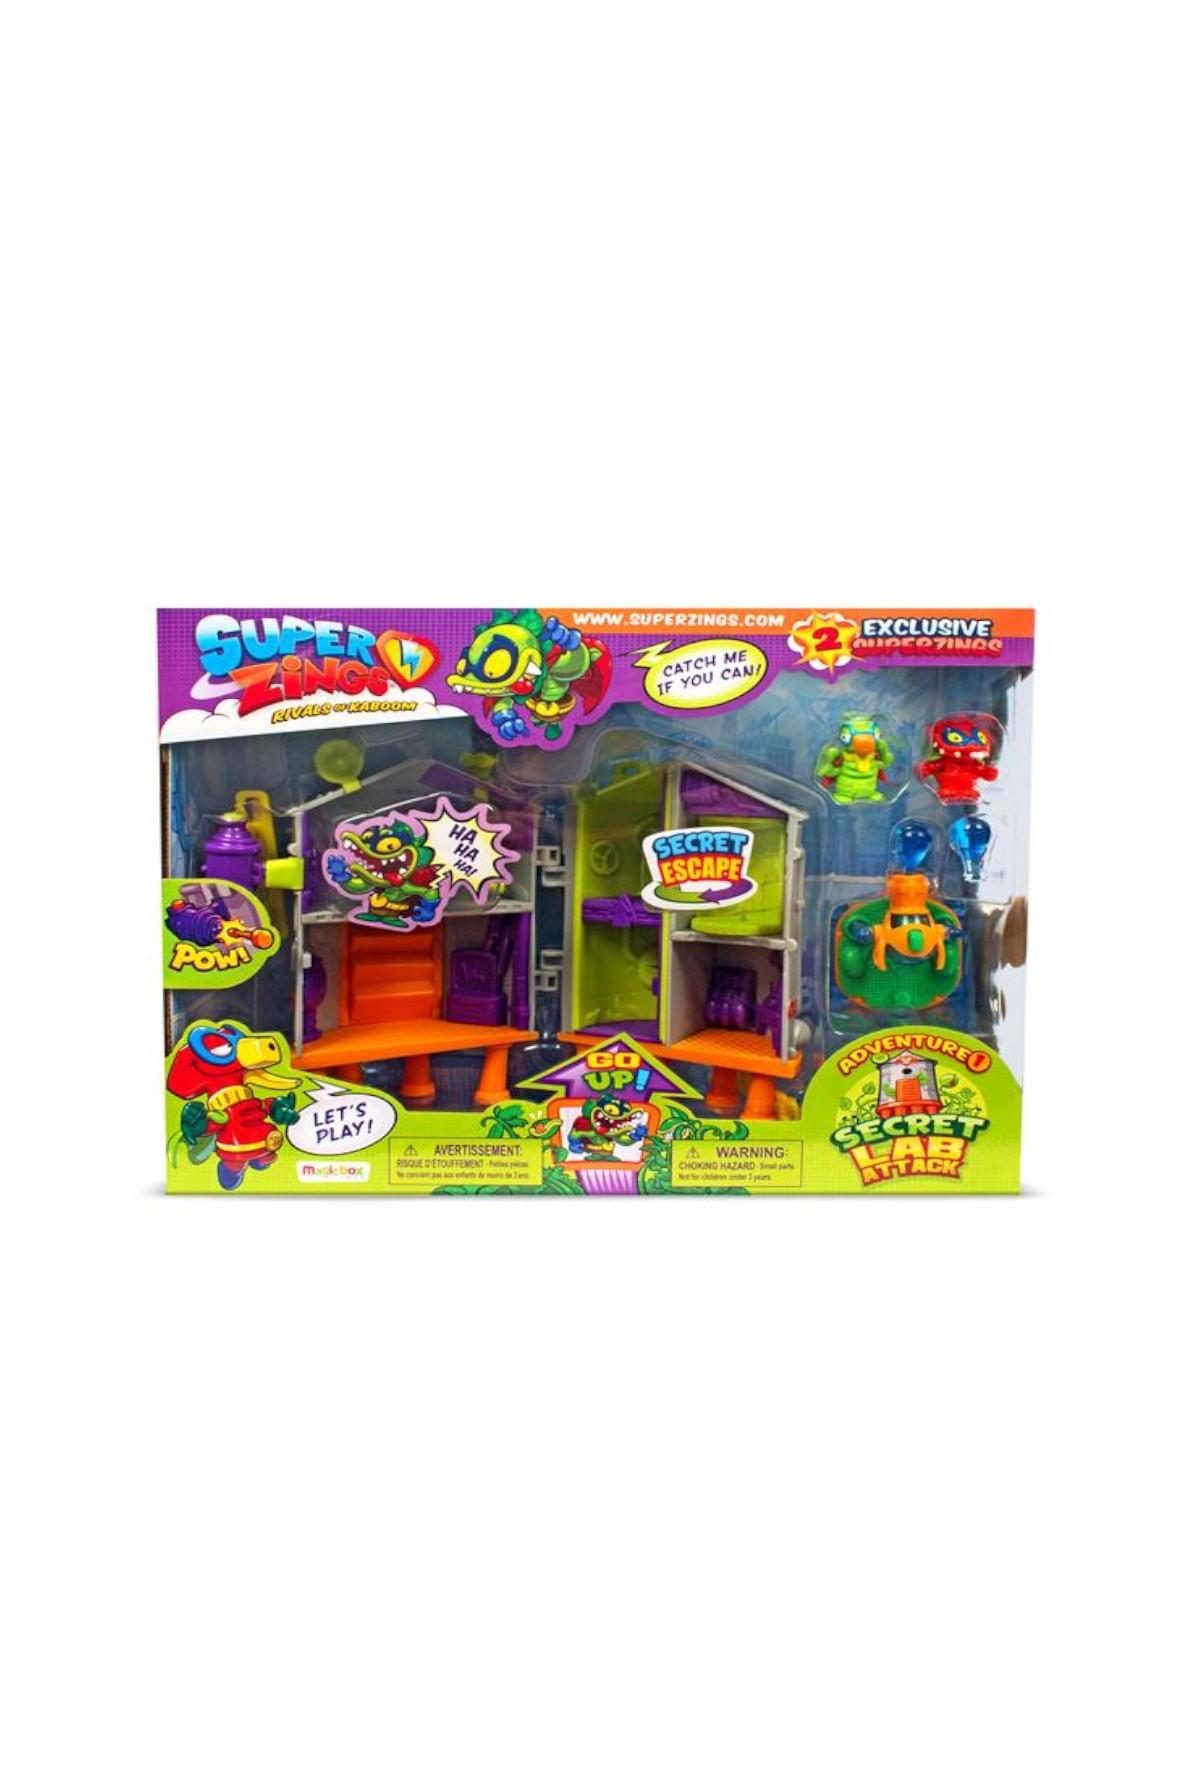 Magic Box Super Zings seria 3 Sekretne Laboratorium + 2 figurki Superzings